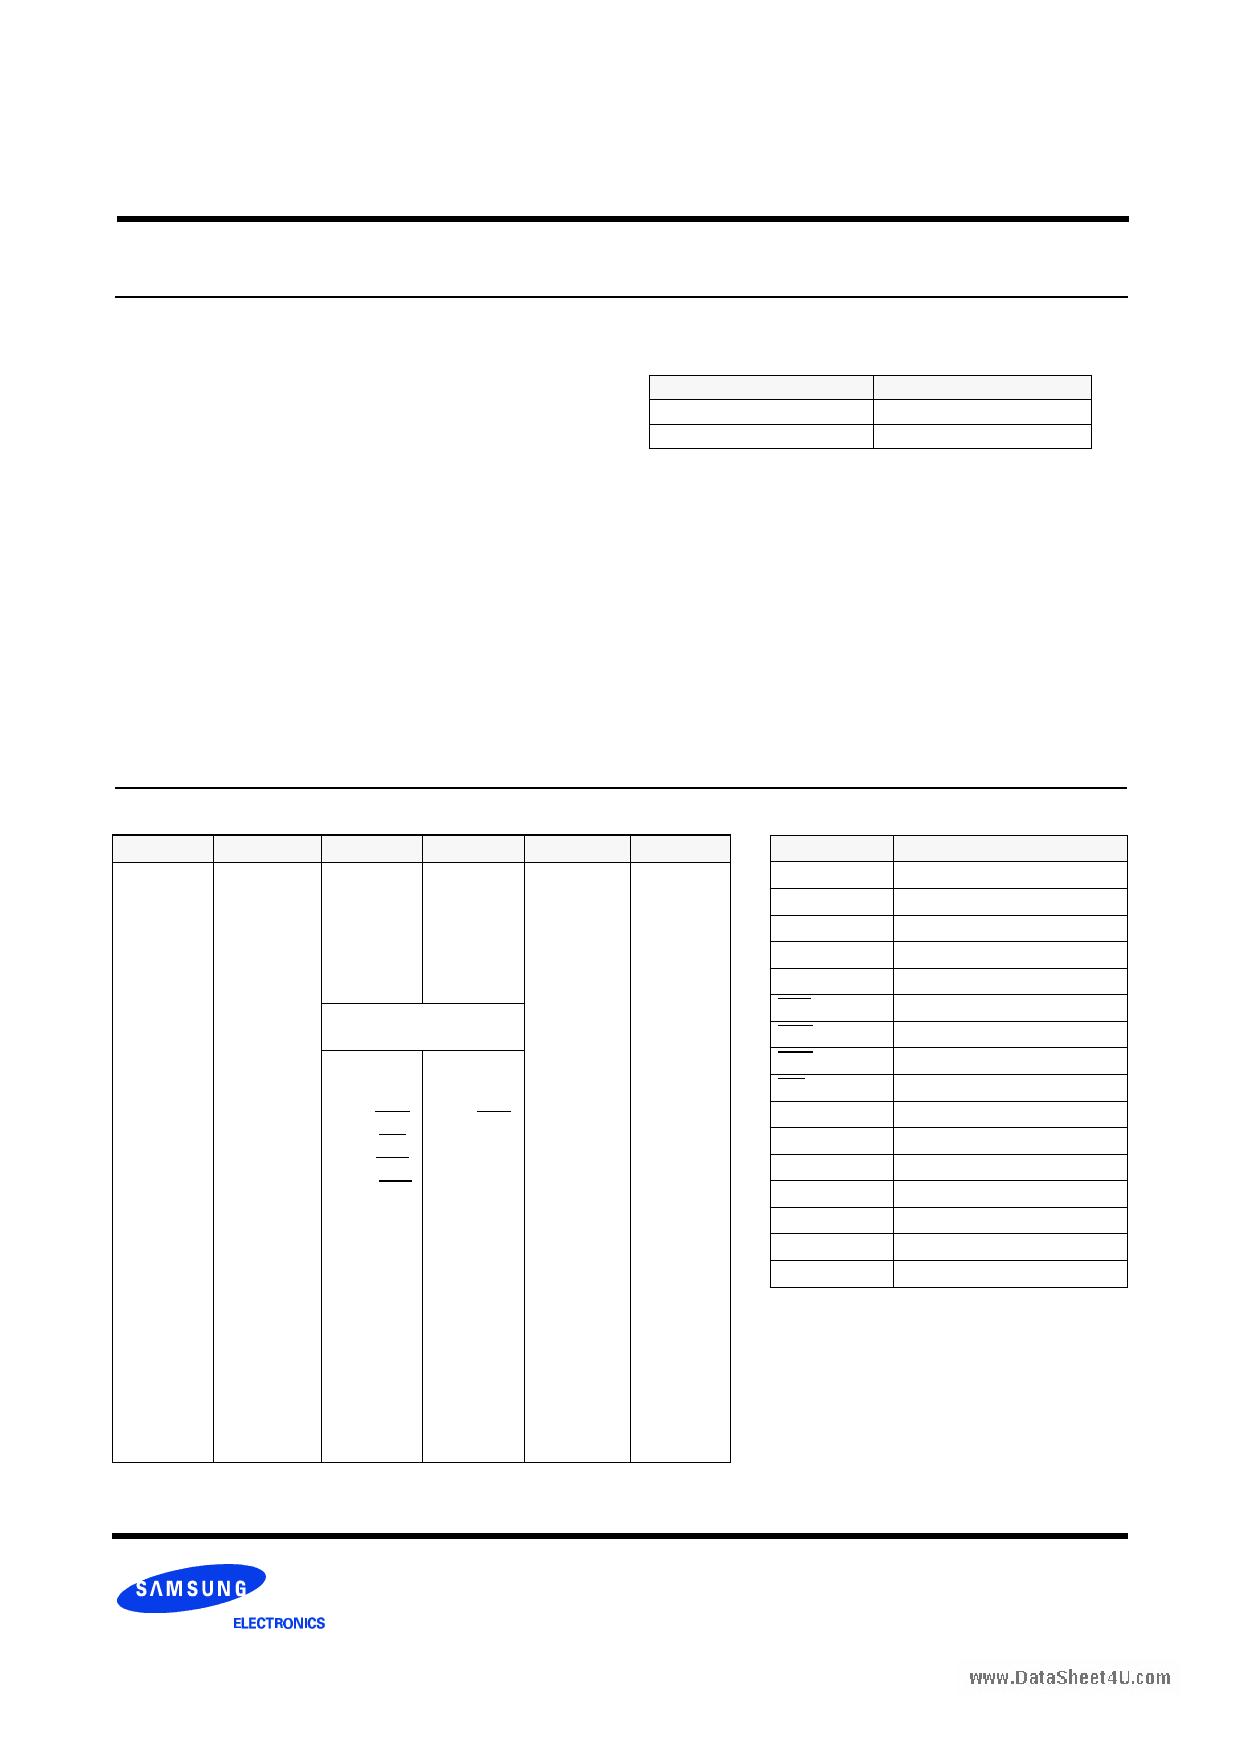 KMM464S924T1 دیتاشیت PDF